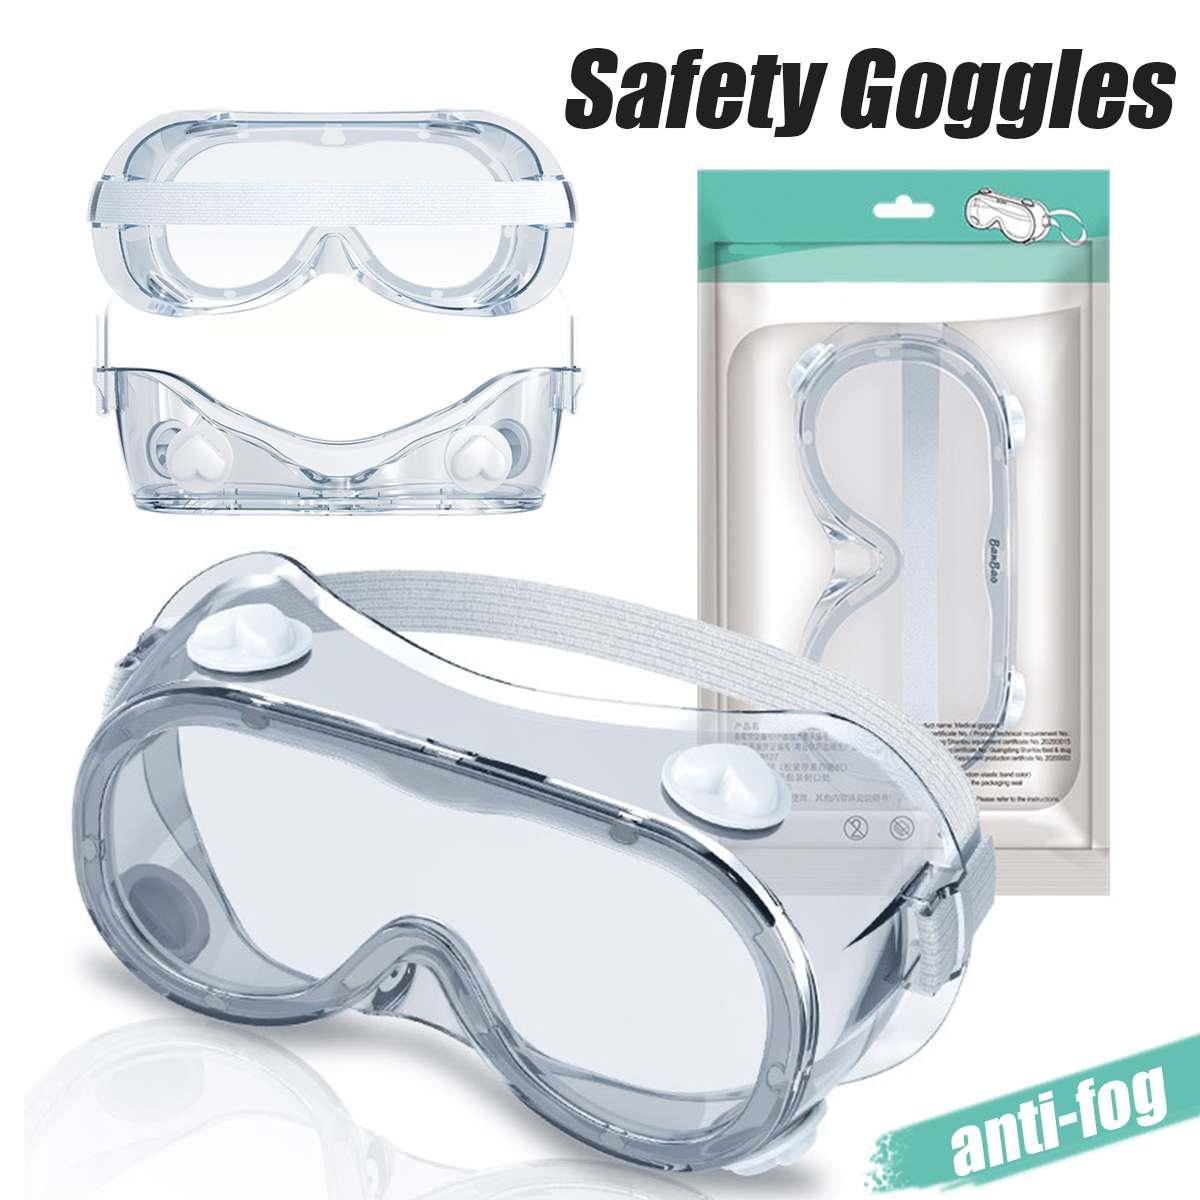 Medical Safety Goggles Fully Enclosed Lens Goggles Eye Protective Glasses Anti-Fog Antisand Dust Splash-proof Resist UV Light